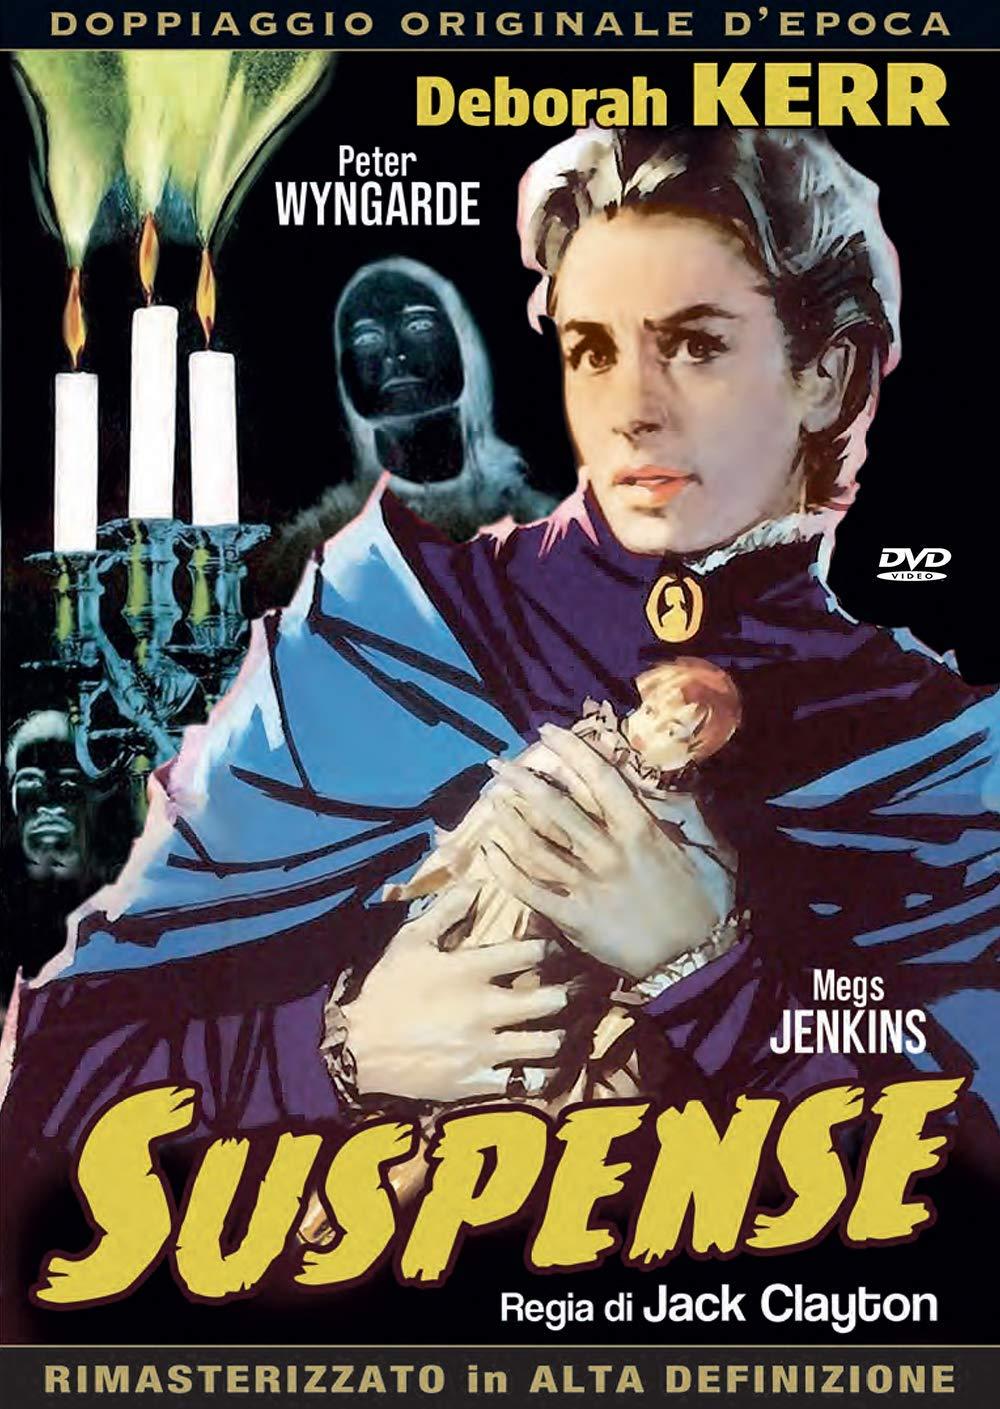 SUSPENSE (DVD)